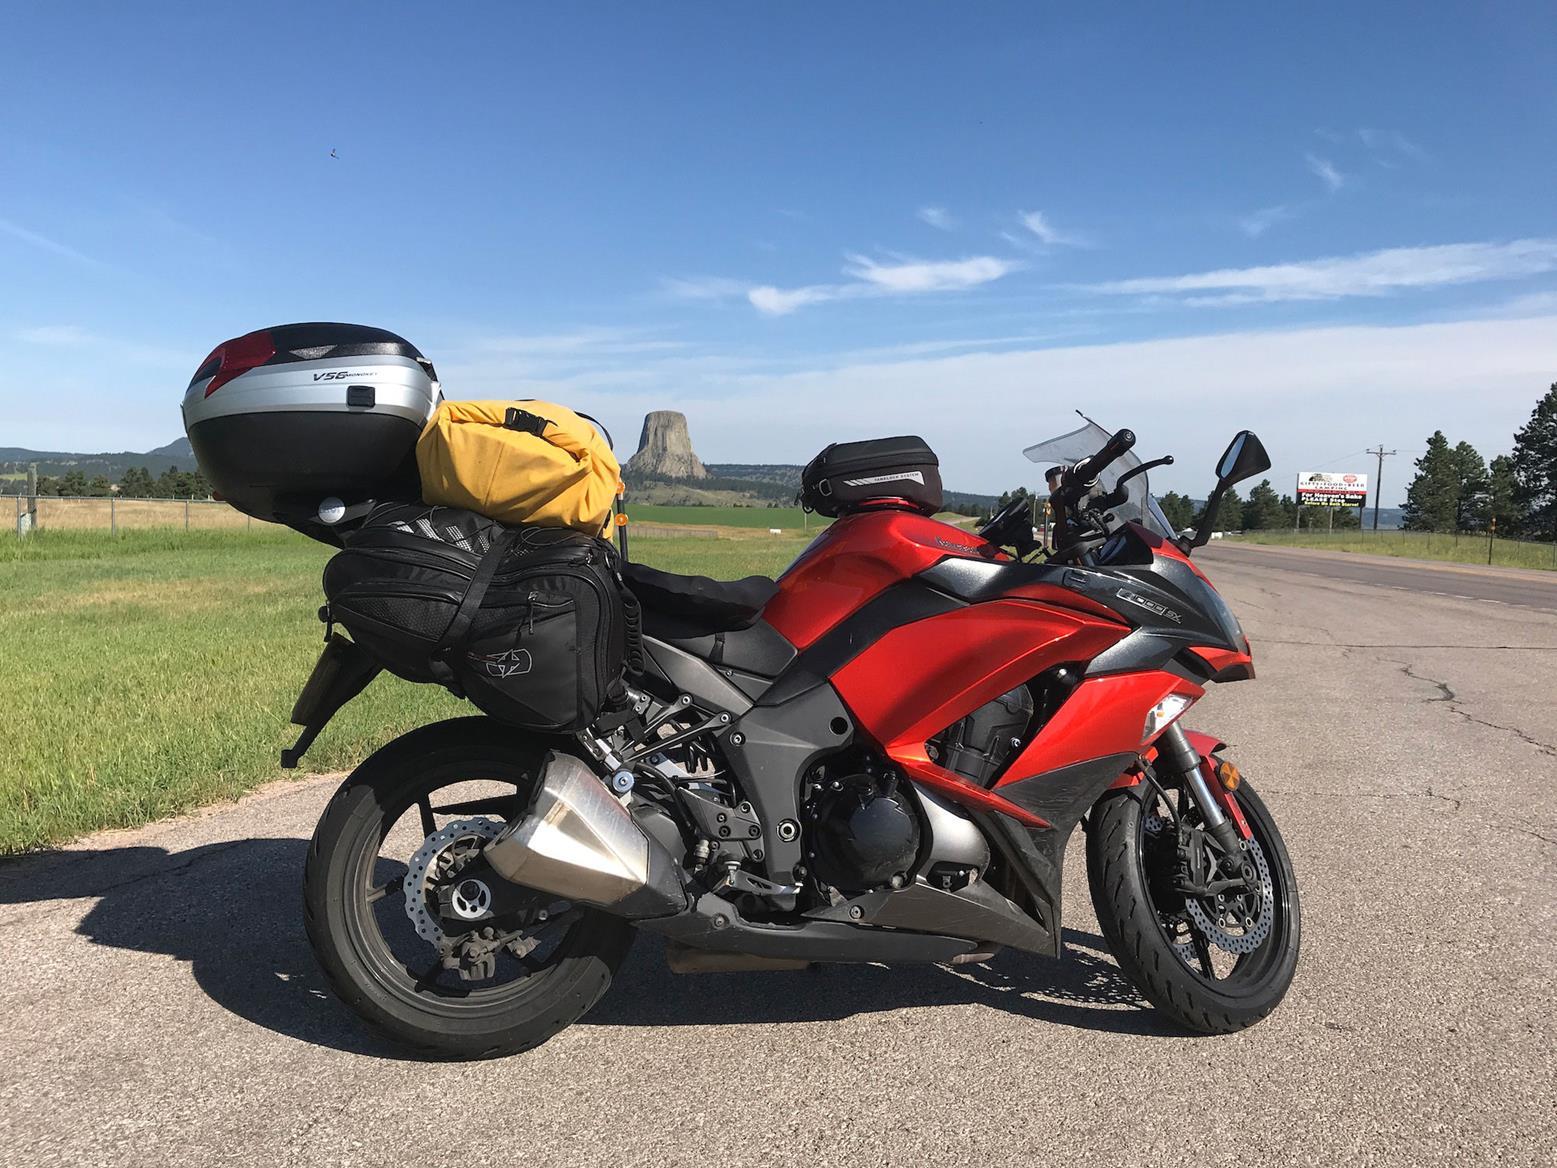 Simon's Kawasaki Z1000SX at Devil's Tower